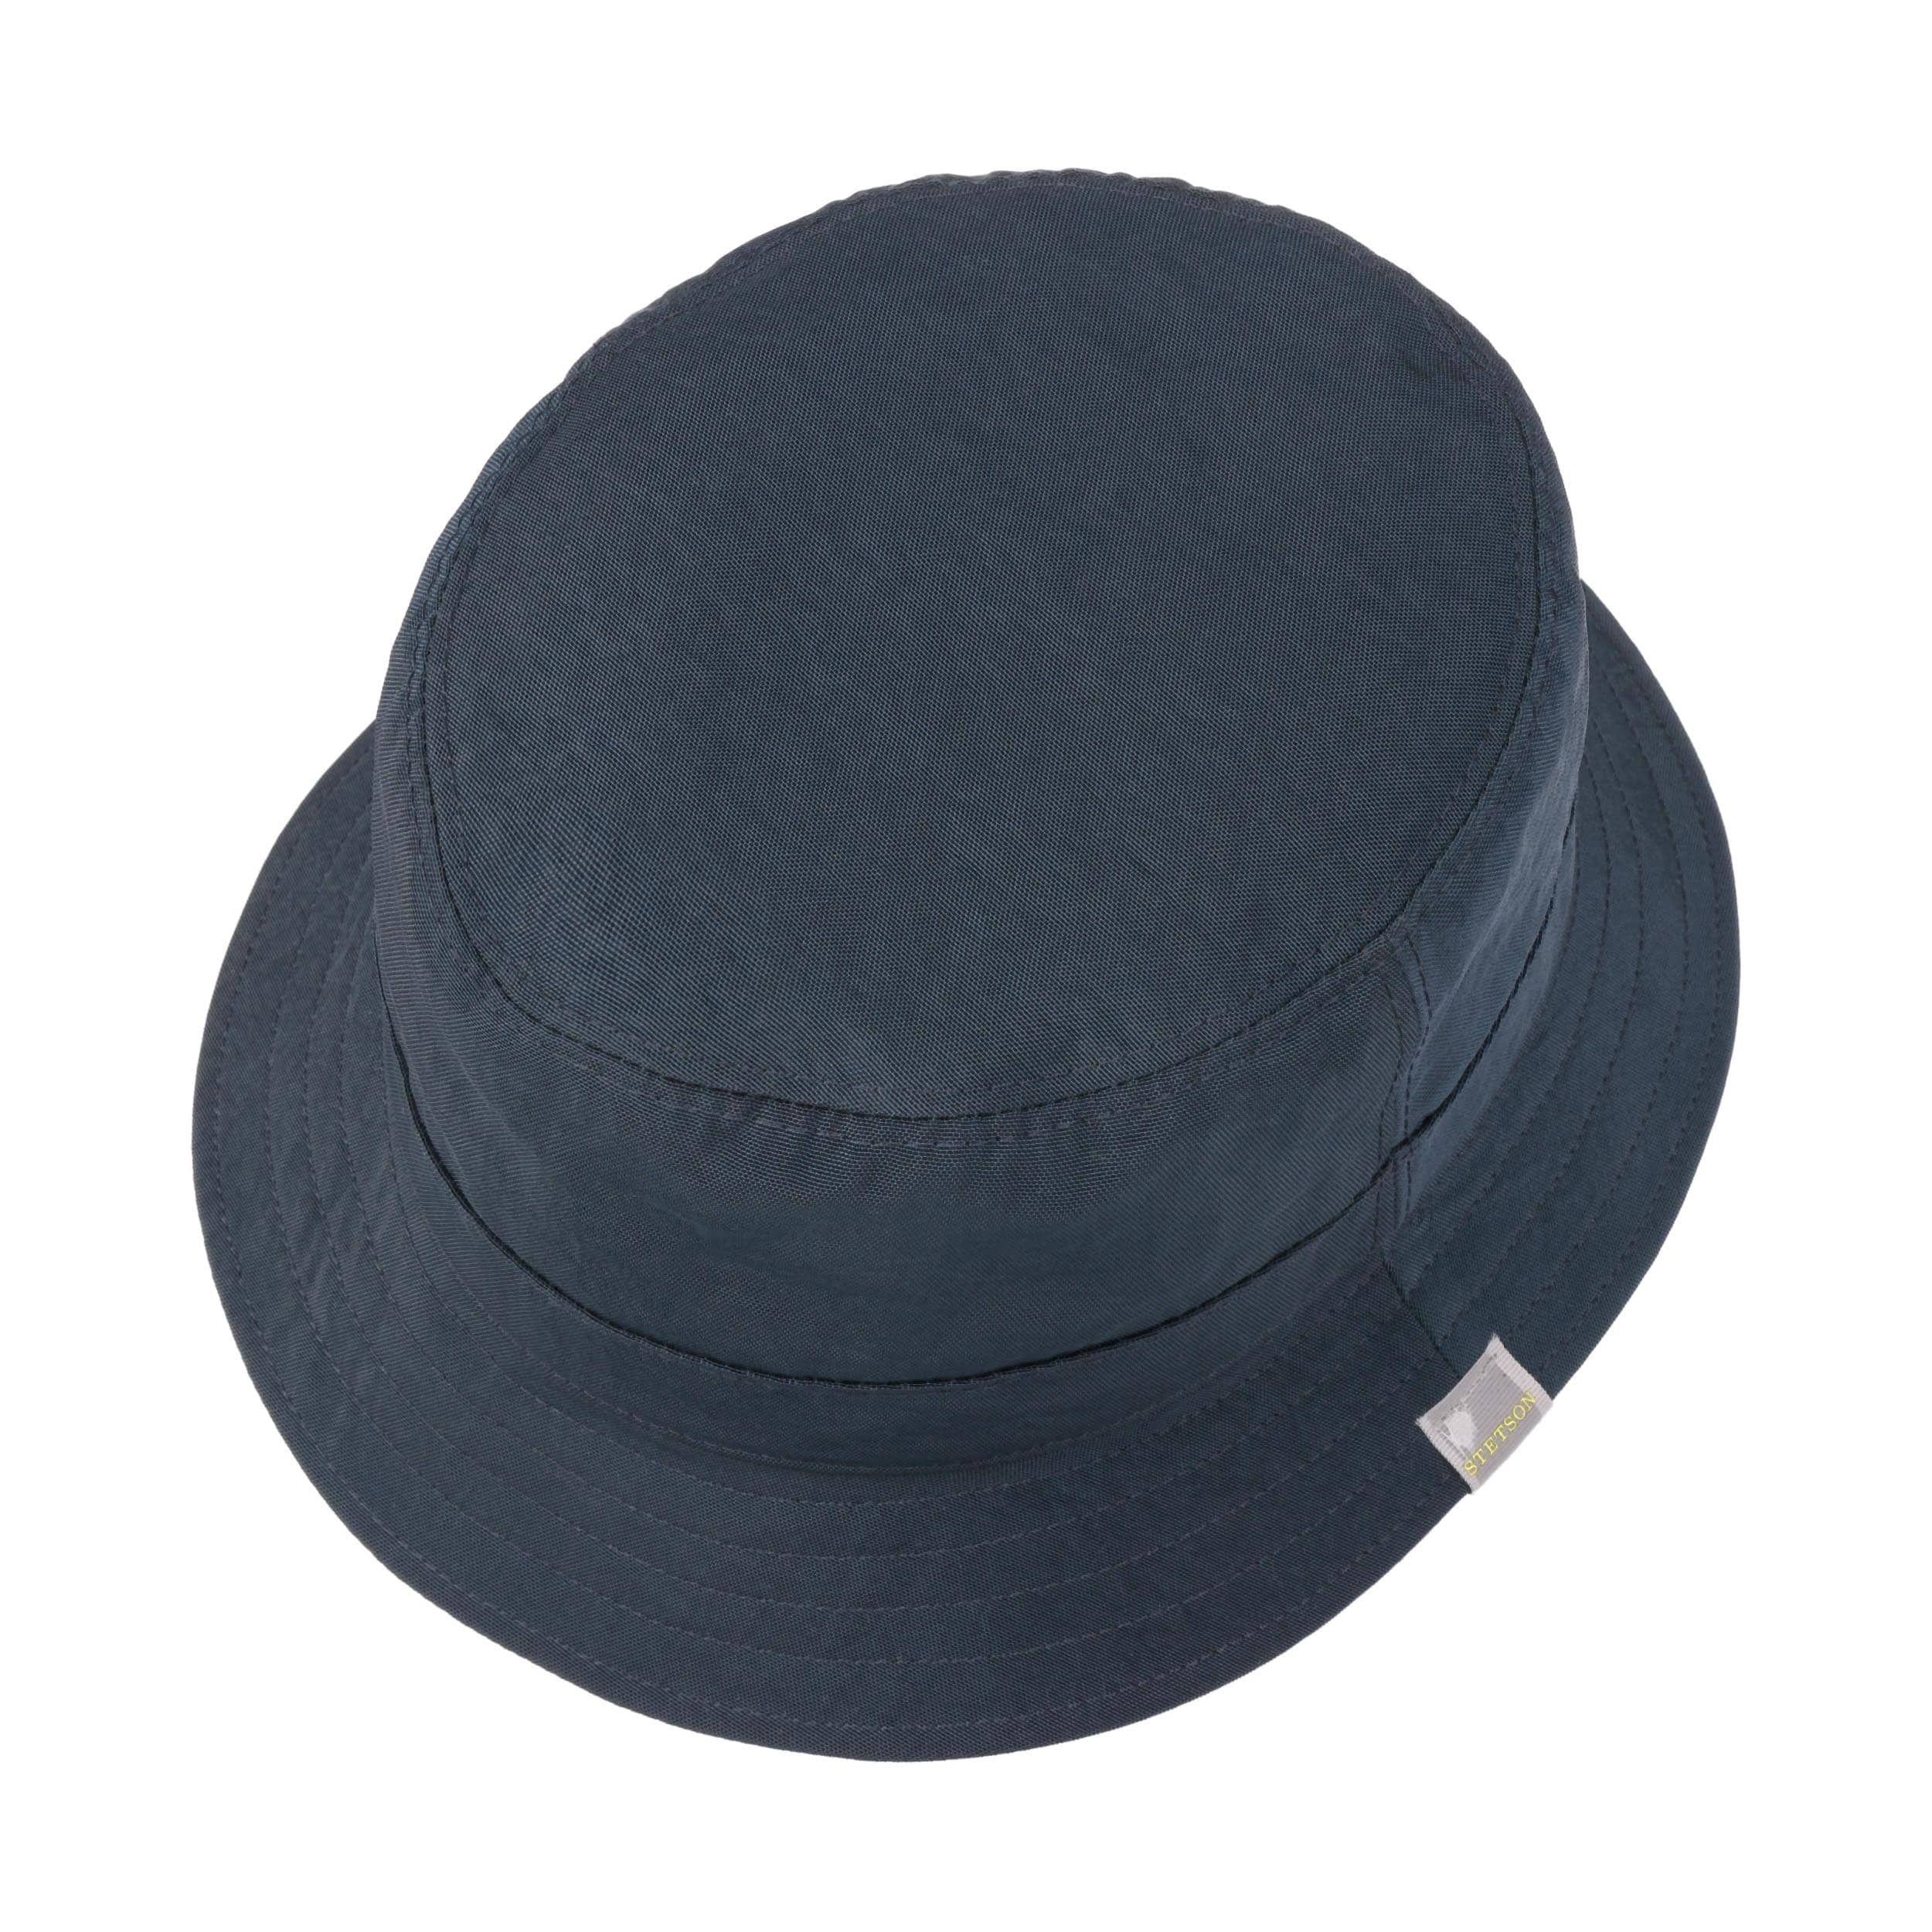 PCM Nylon Bucket Fishing Hat navy